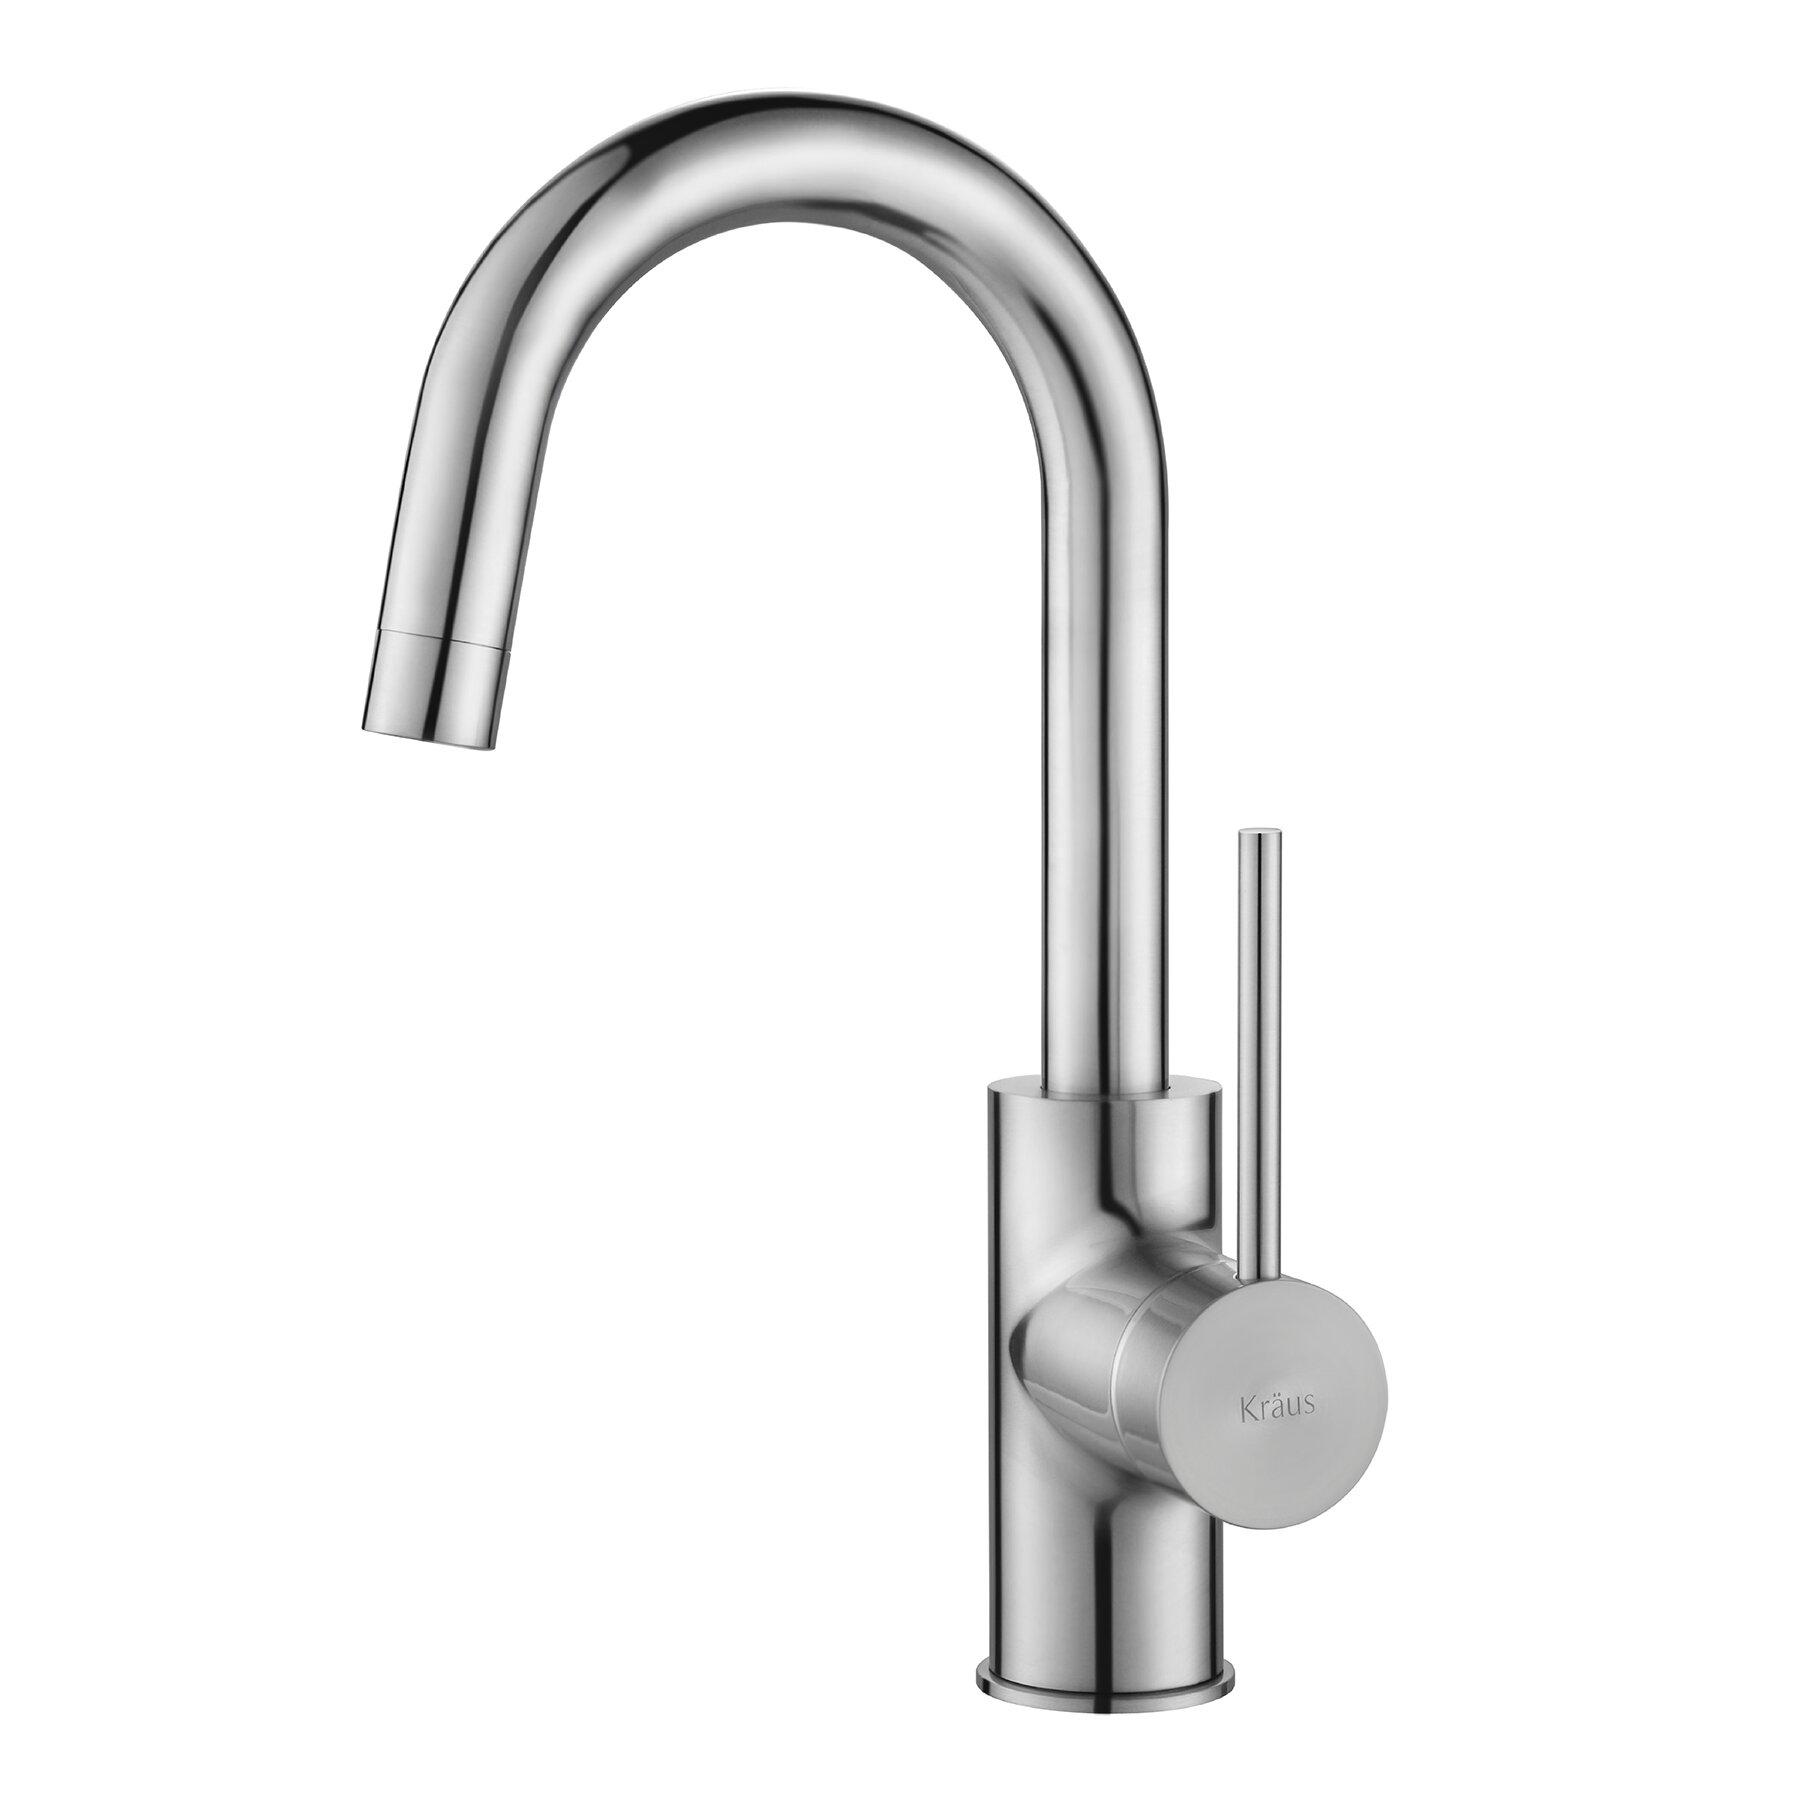 kitchen faucet commercial style hahn commercial style prerinse kraus nola single lever flex commercial style kitchen faucet